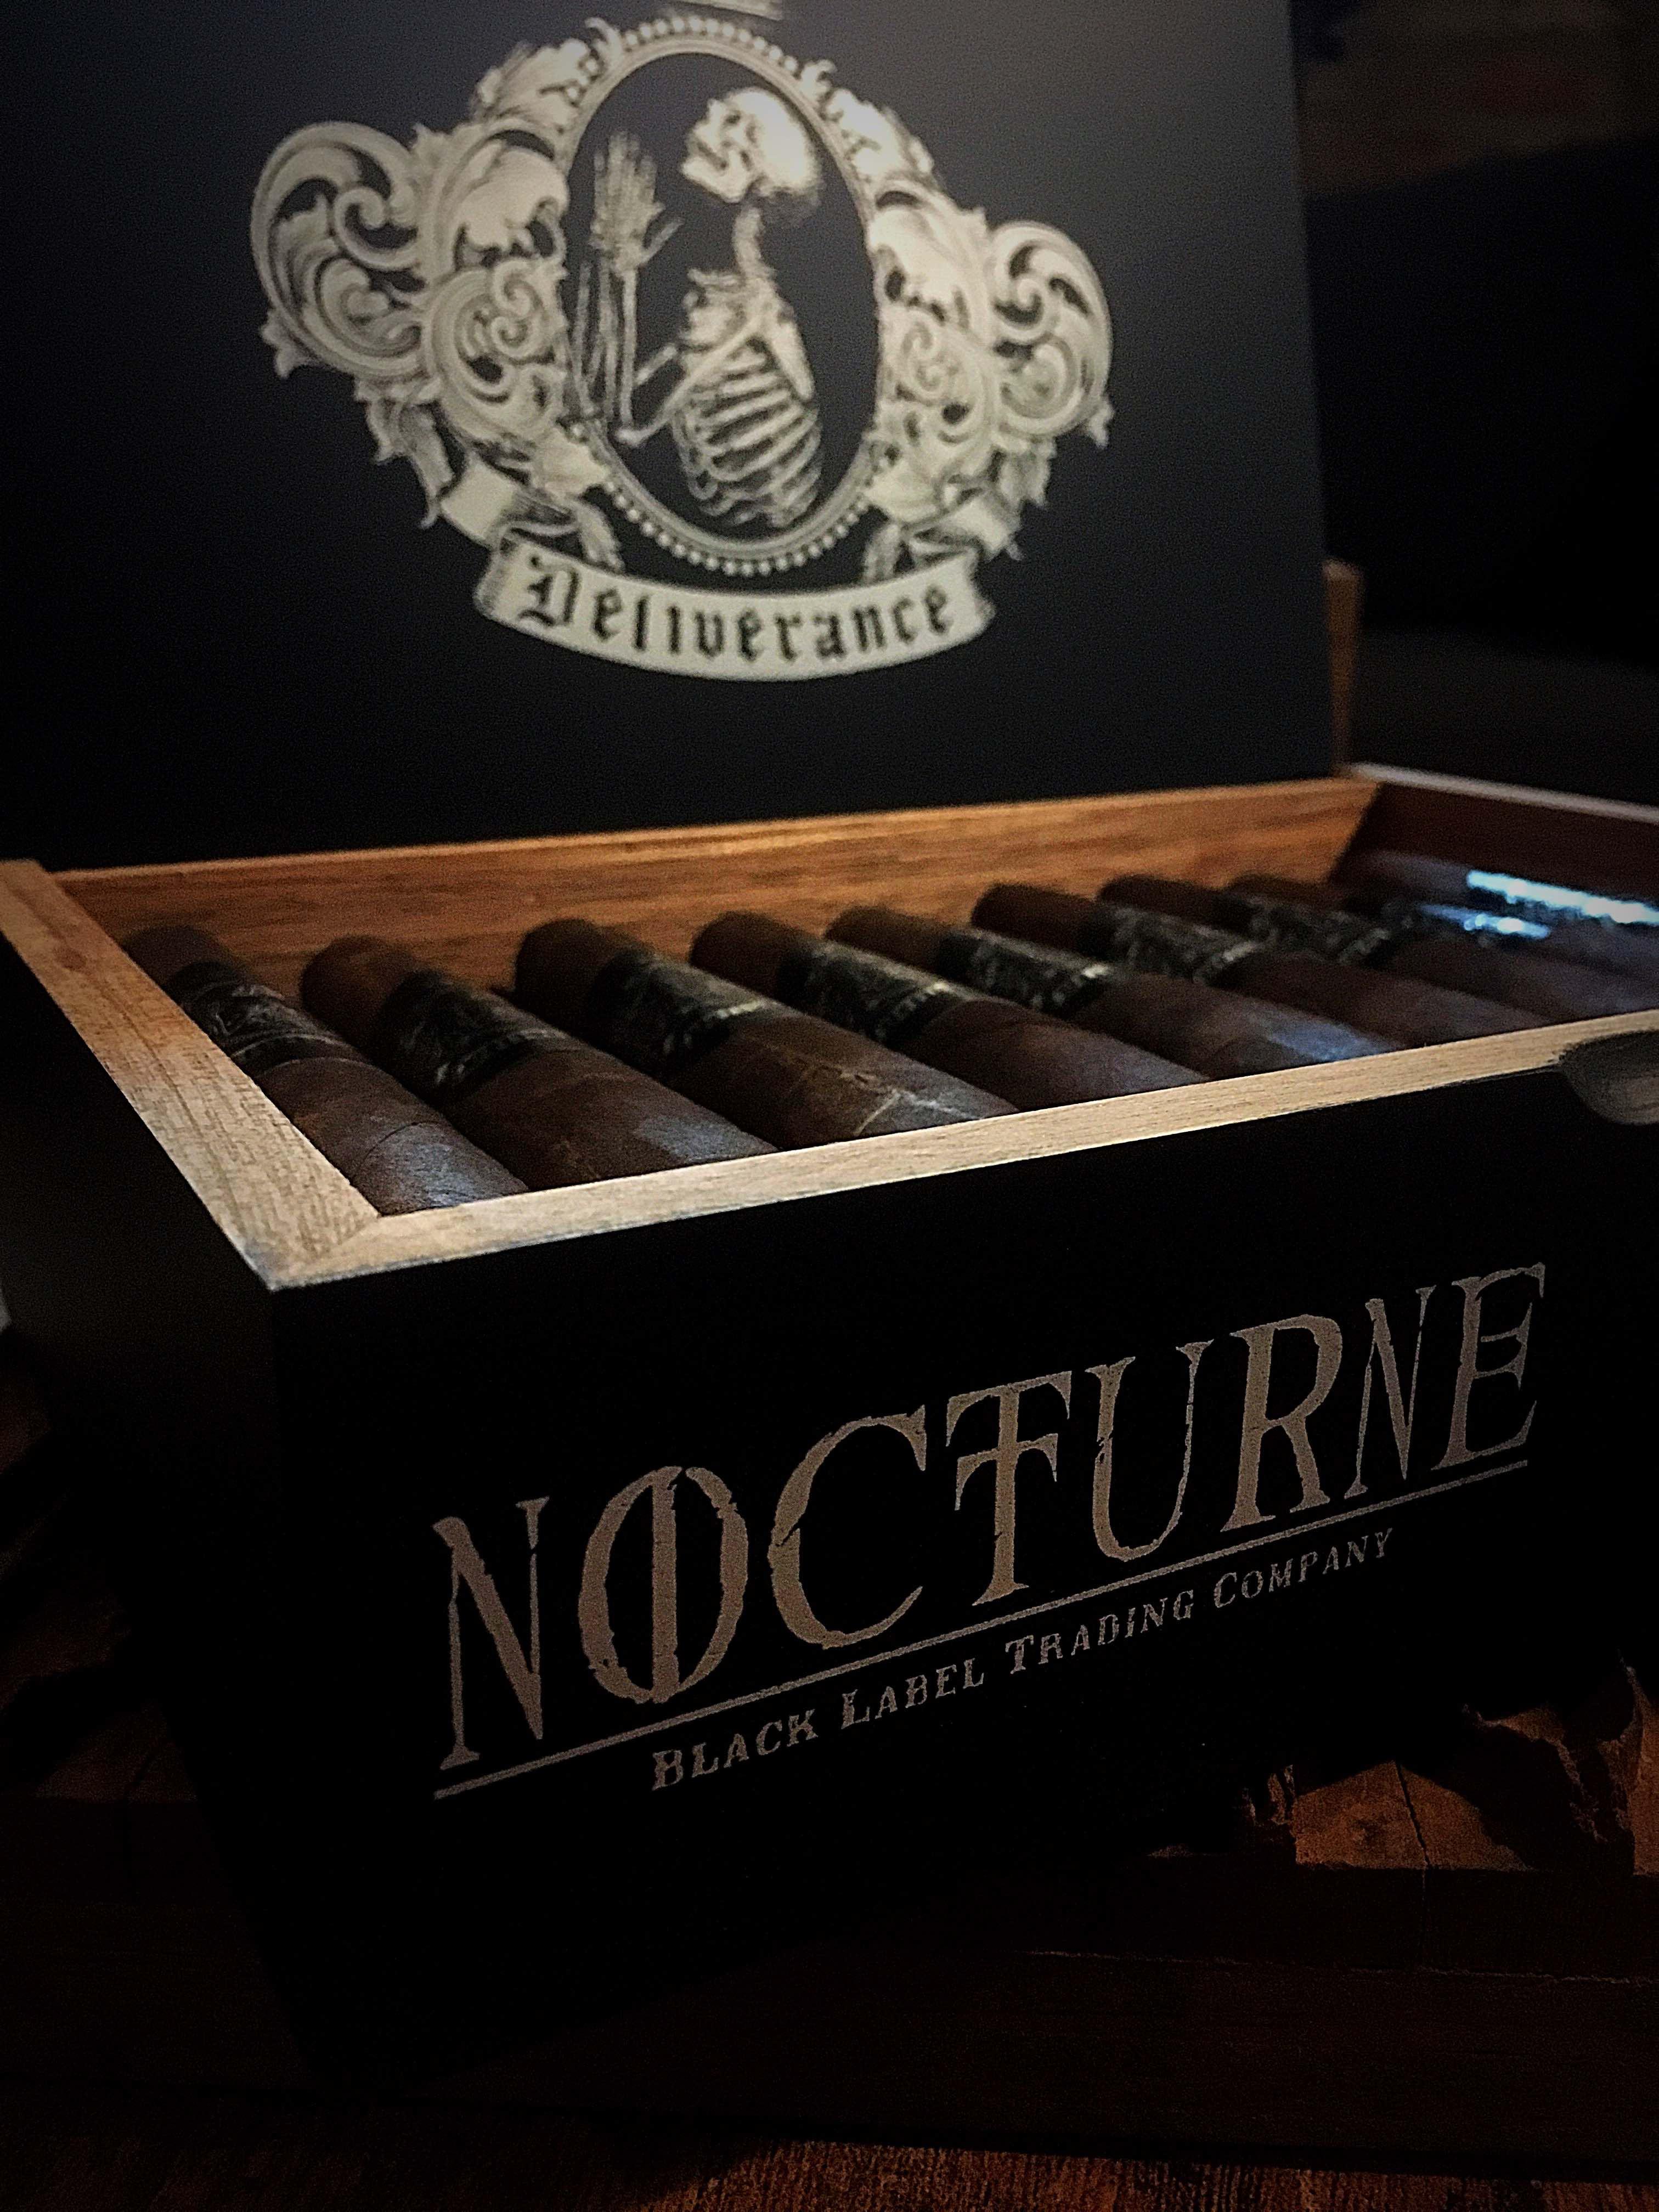 Black Label Trading Company Deliverance Nocturne